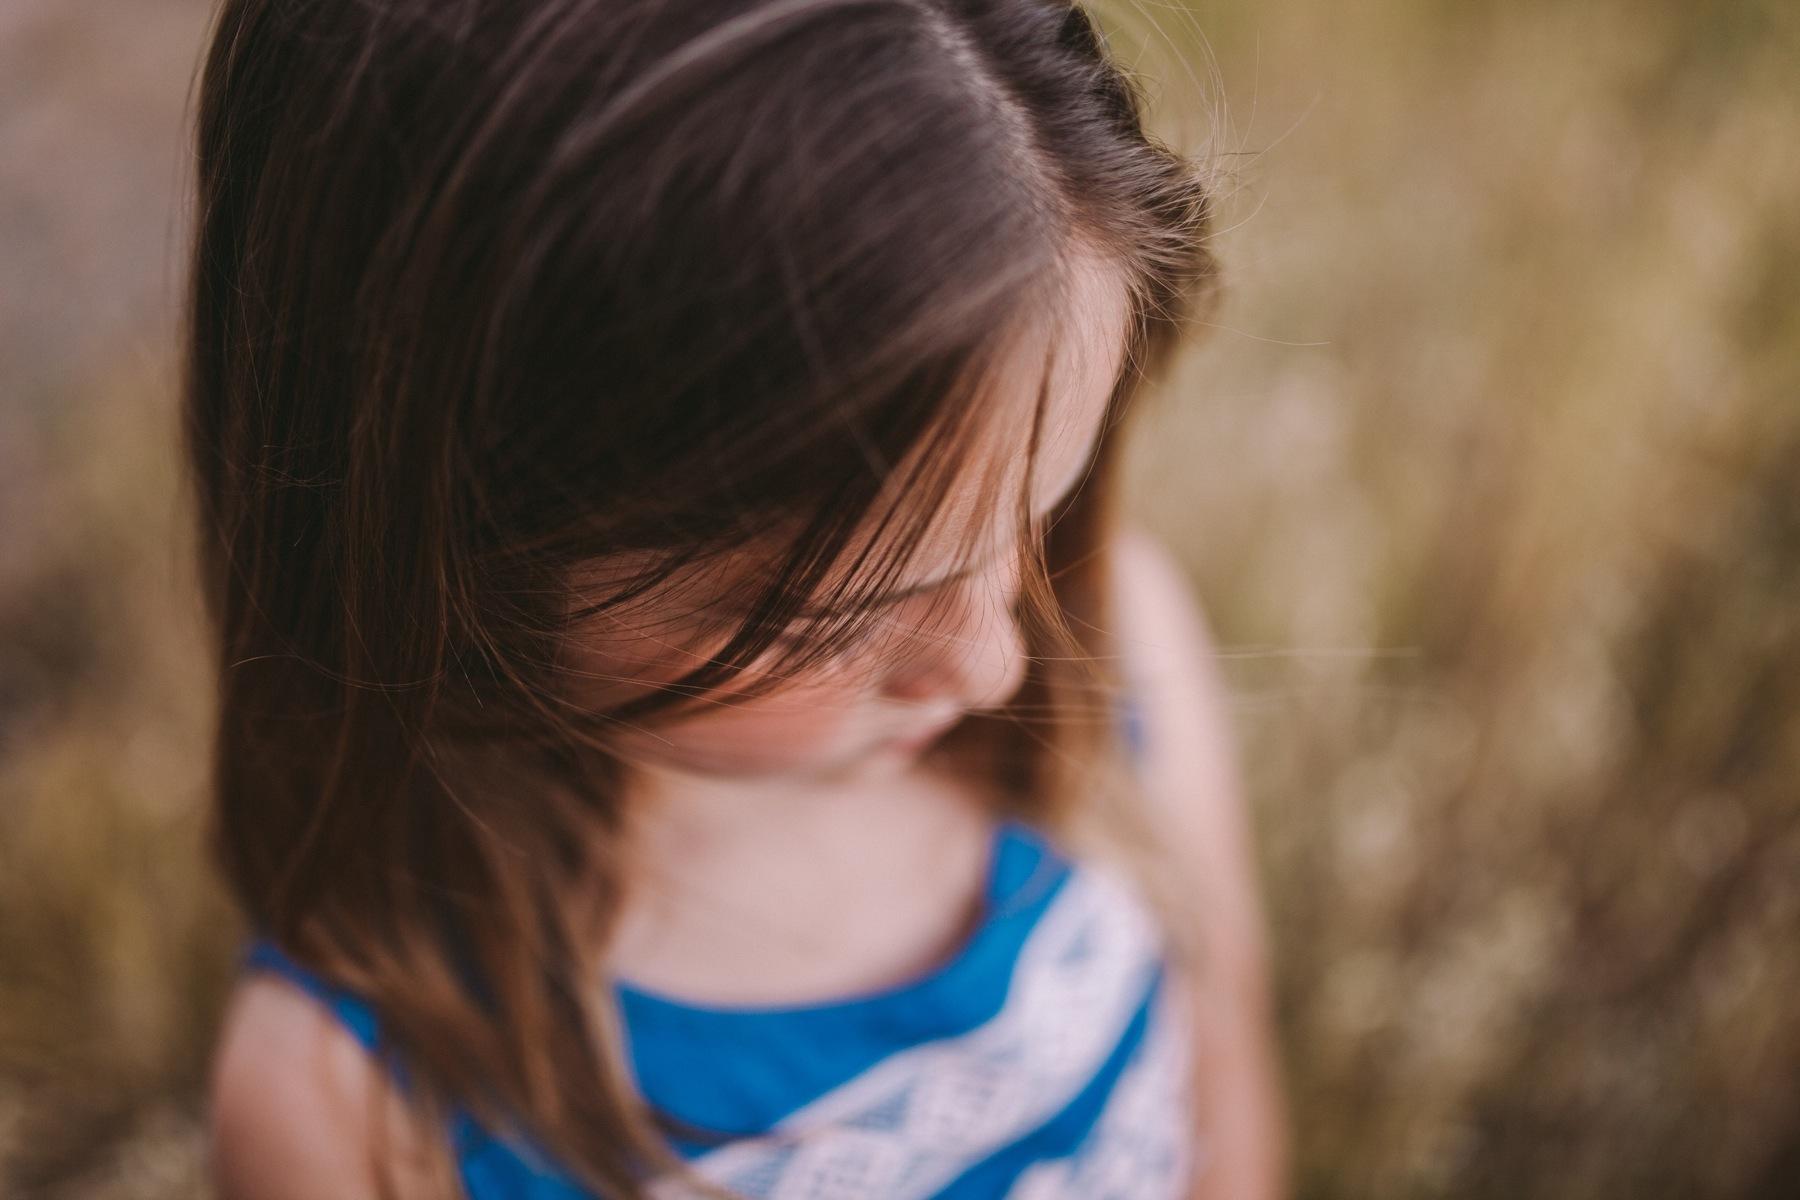 Sonora Tuolumne County Kids Family Photography Shoot 29.JPG